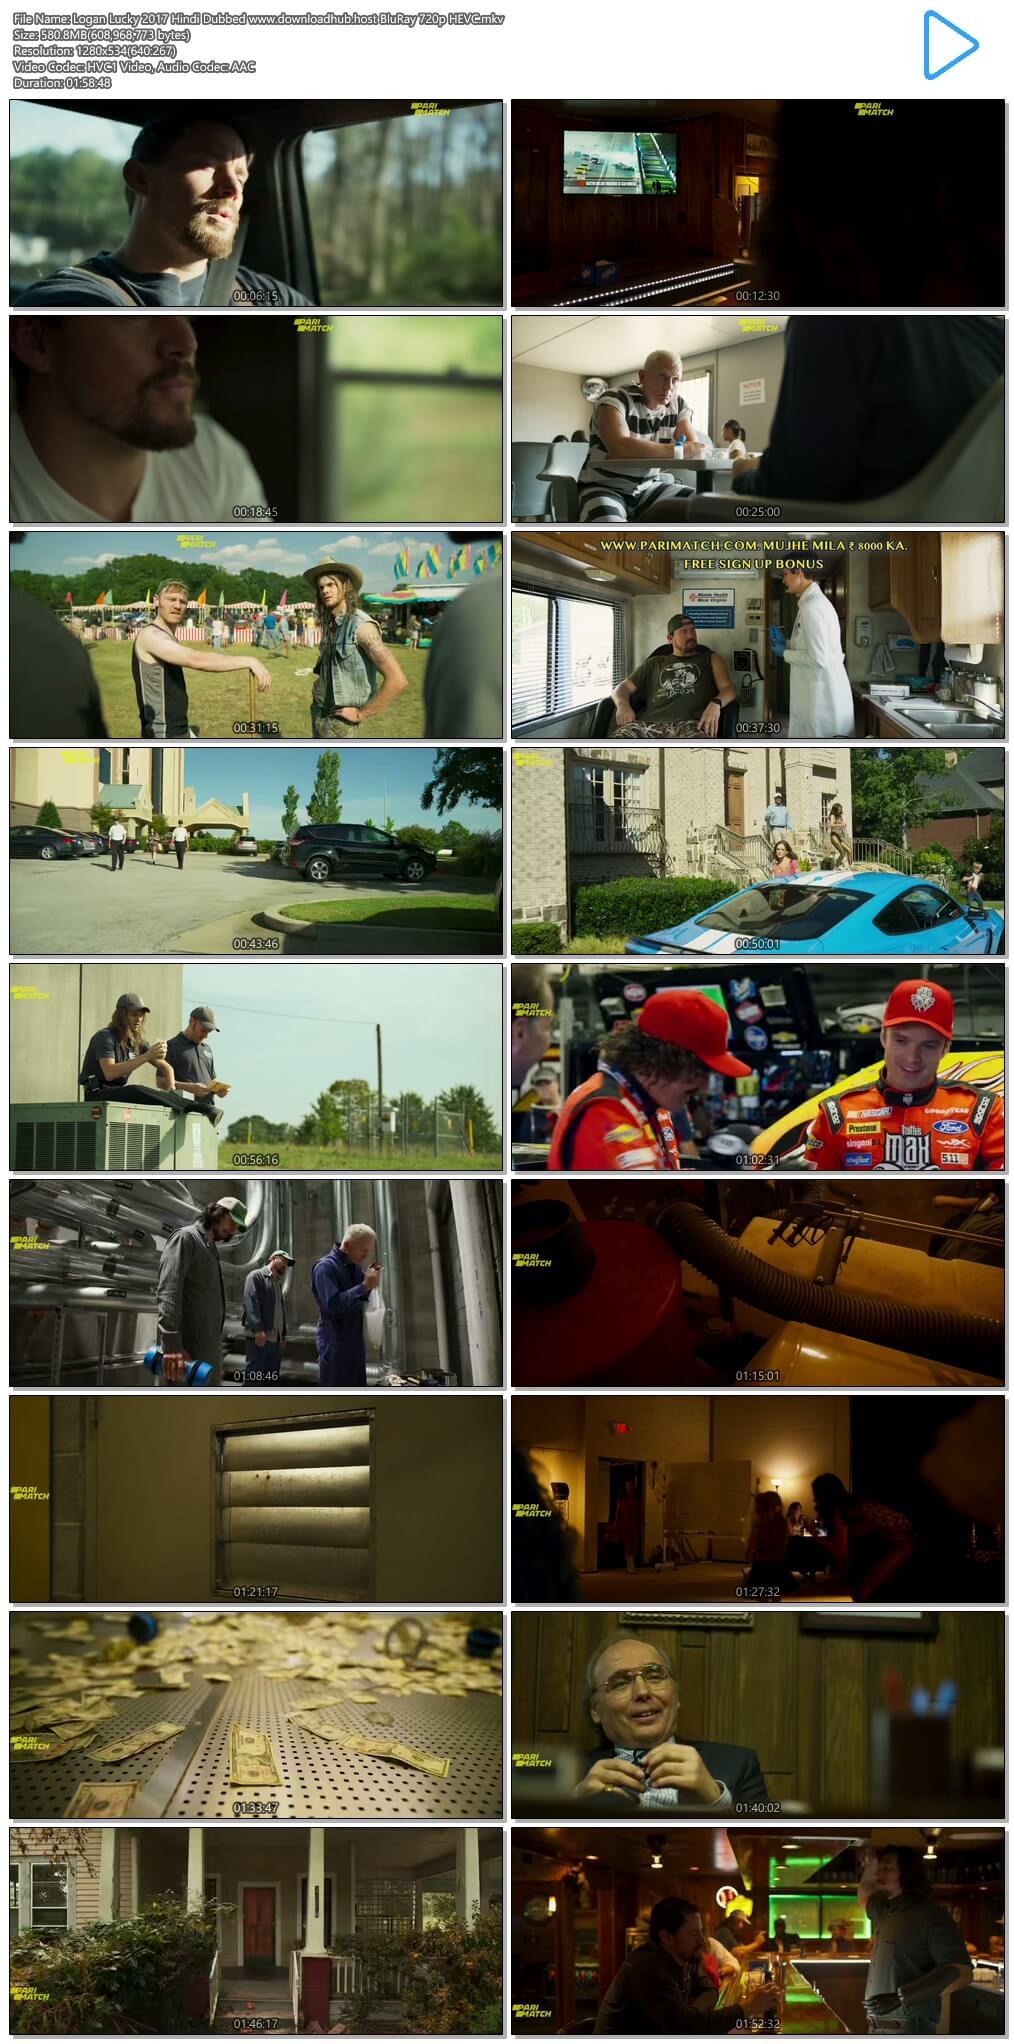 Logan Lucky 2017 Hindi Dubbed 550MB BluRay 720p HEVC